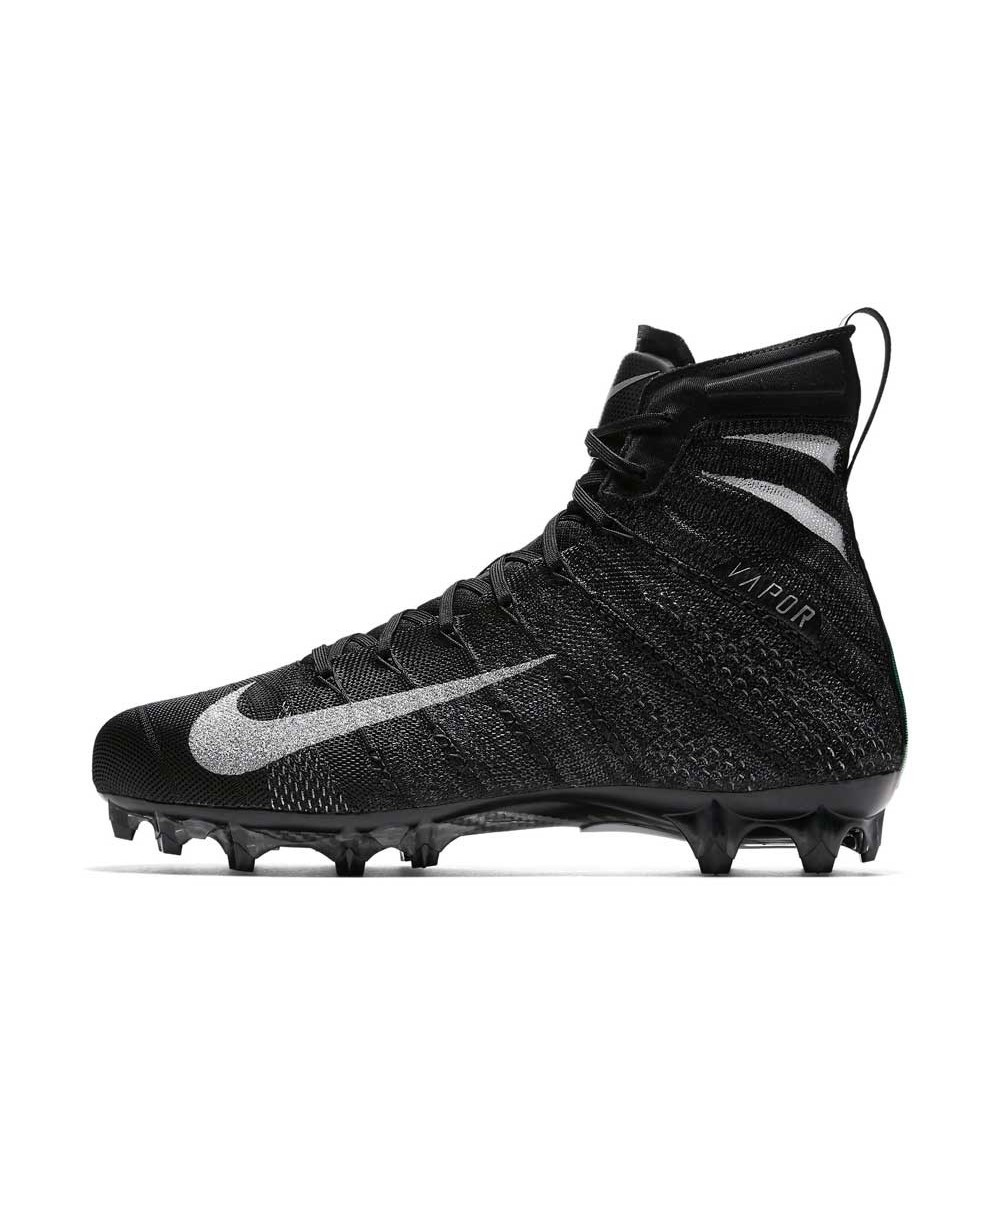 78779c5b3 Nike Men s Vapor Untouchable 3 Elite American Football Cleats Black